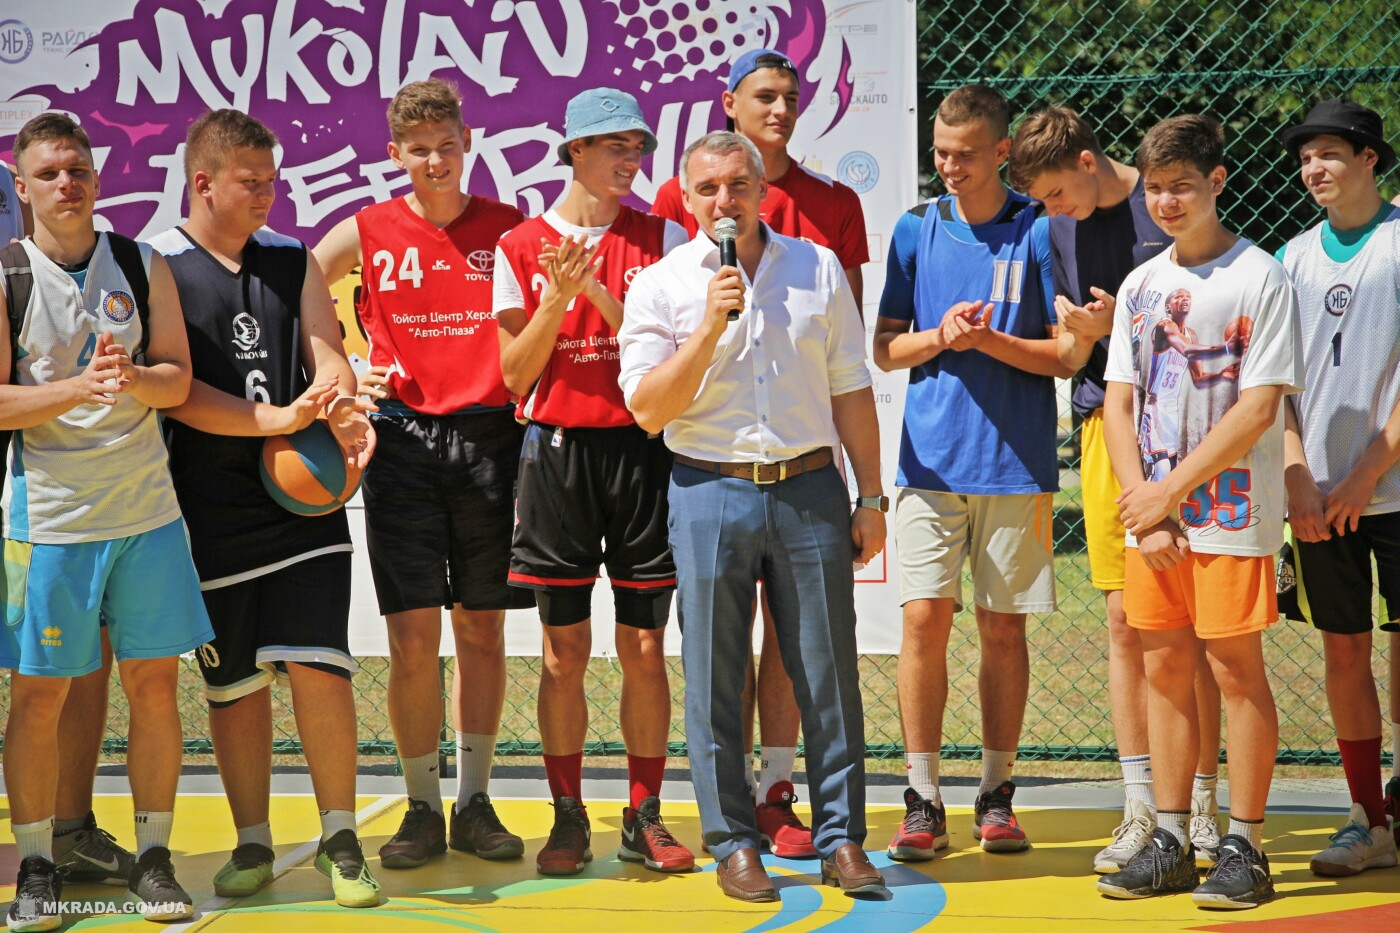 Команда «МрийДий» представила первую в Украине баскетбольную площадку в стиле street art, - ФОТО, фото-9